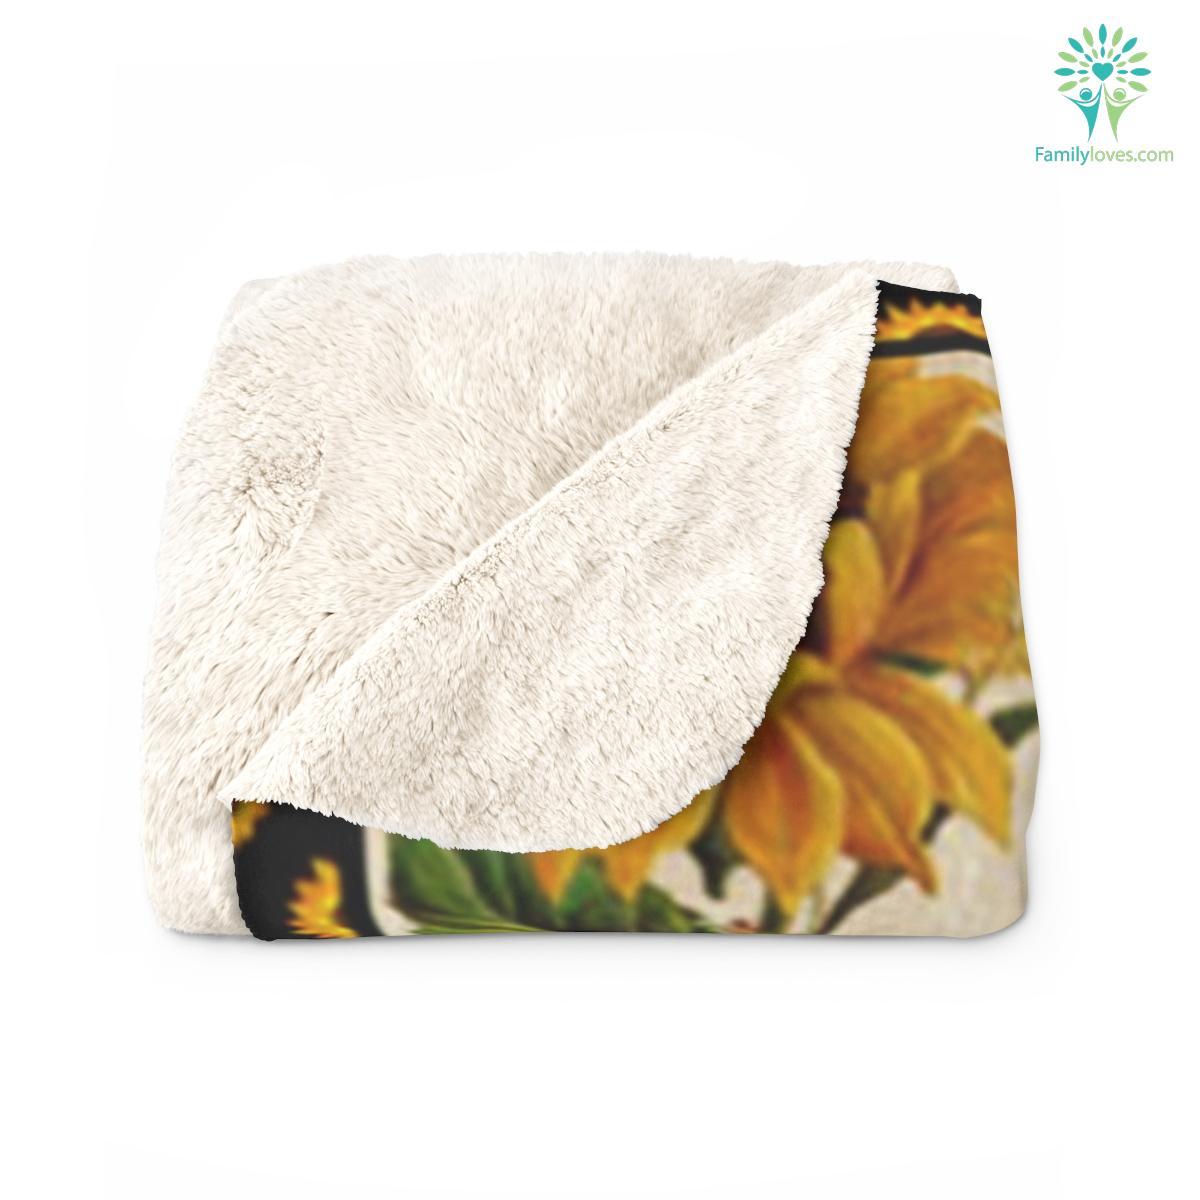 For My Mom Quotes Sherpa Fleece Blanket Familyloves.com